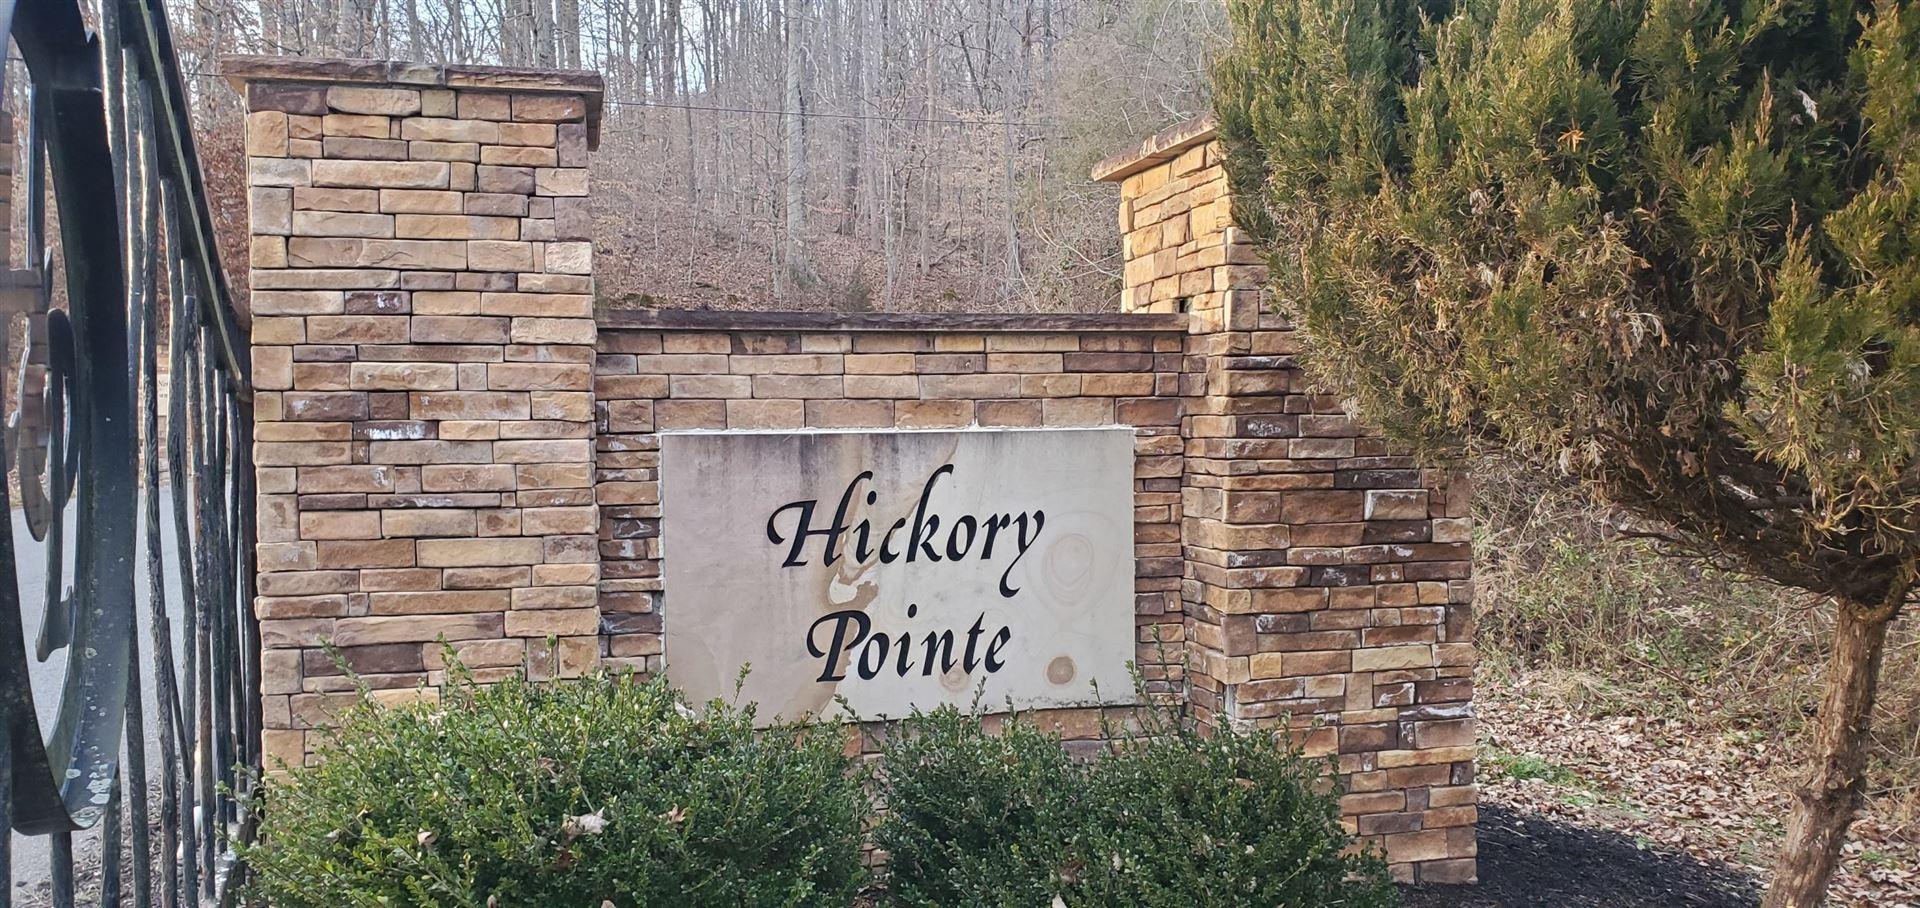 Photo of Lot 13 Hickory Pointe, Maynardville, TN 37807 (MLS # 1140160)